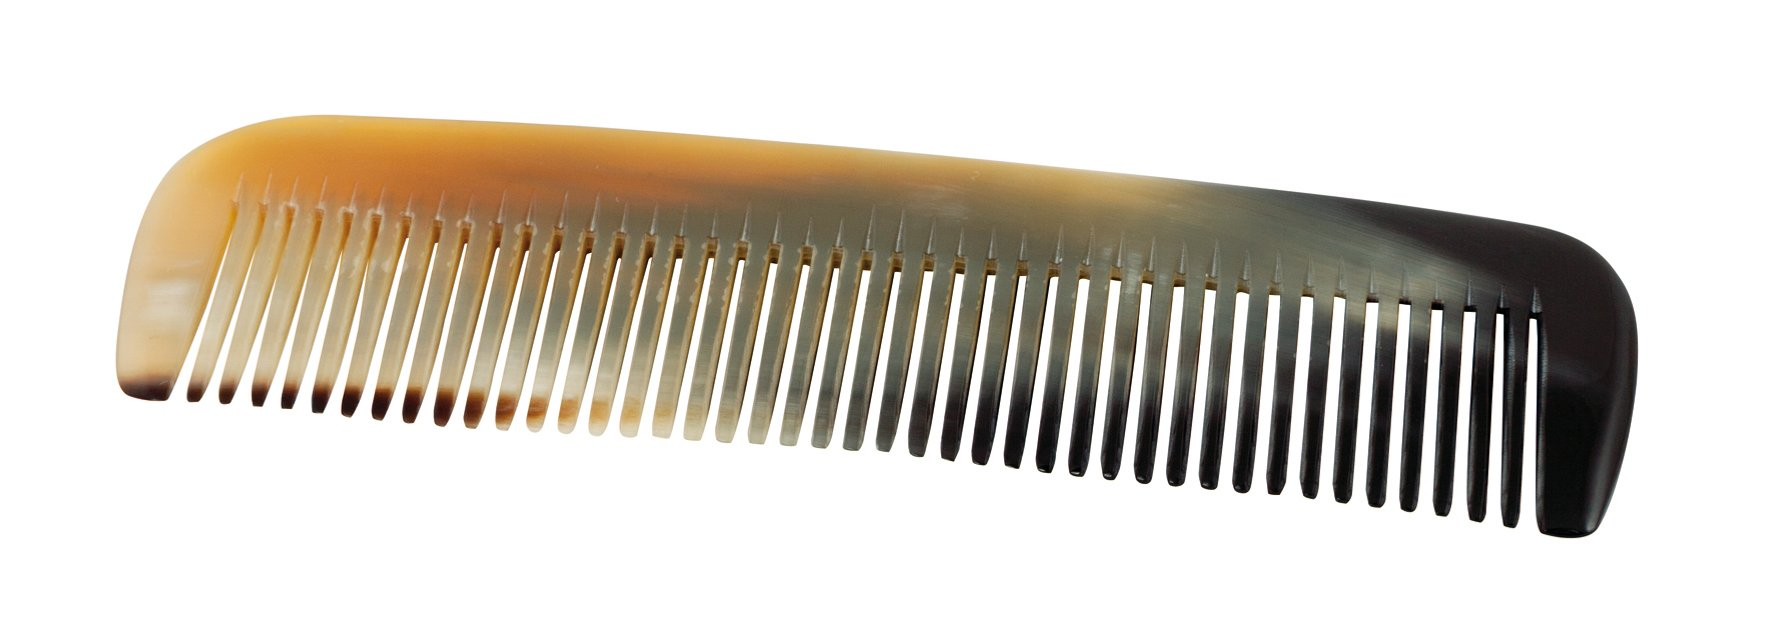 Redecker Cattle Horn Comb, 5-7/8-Inches by REDECKER